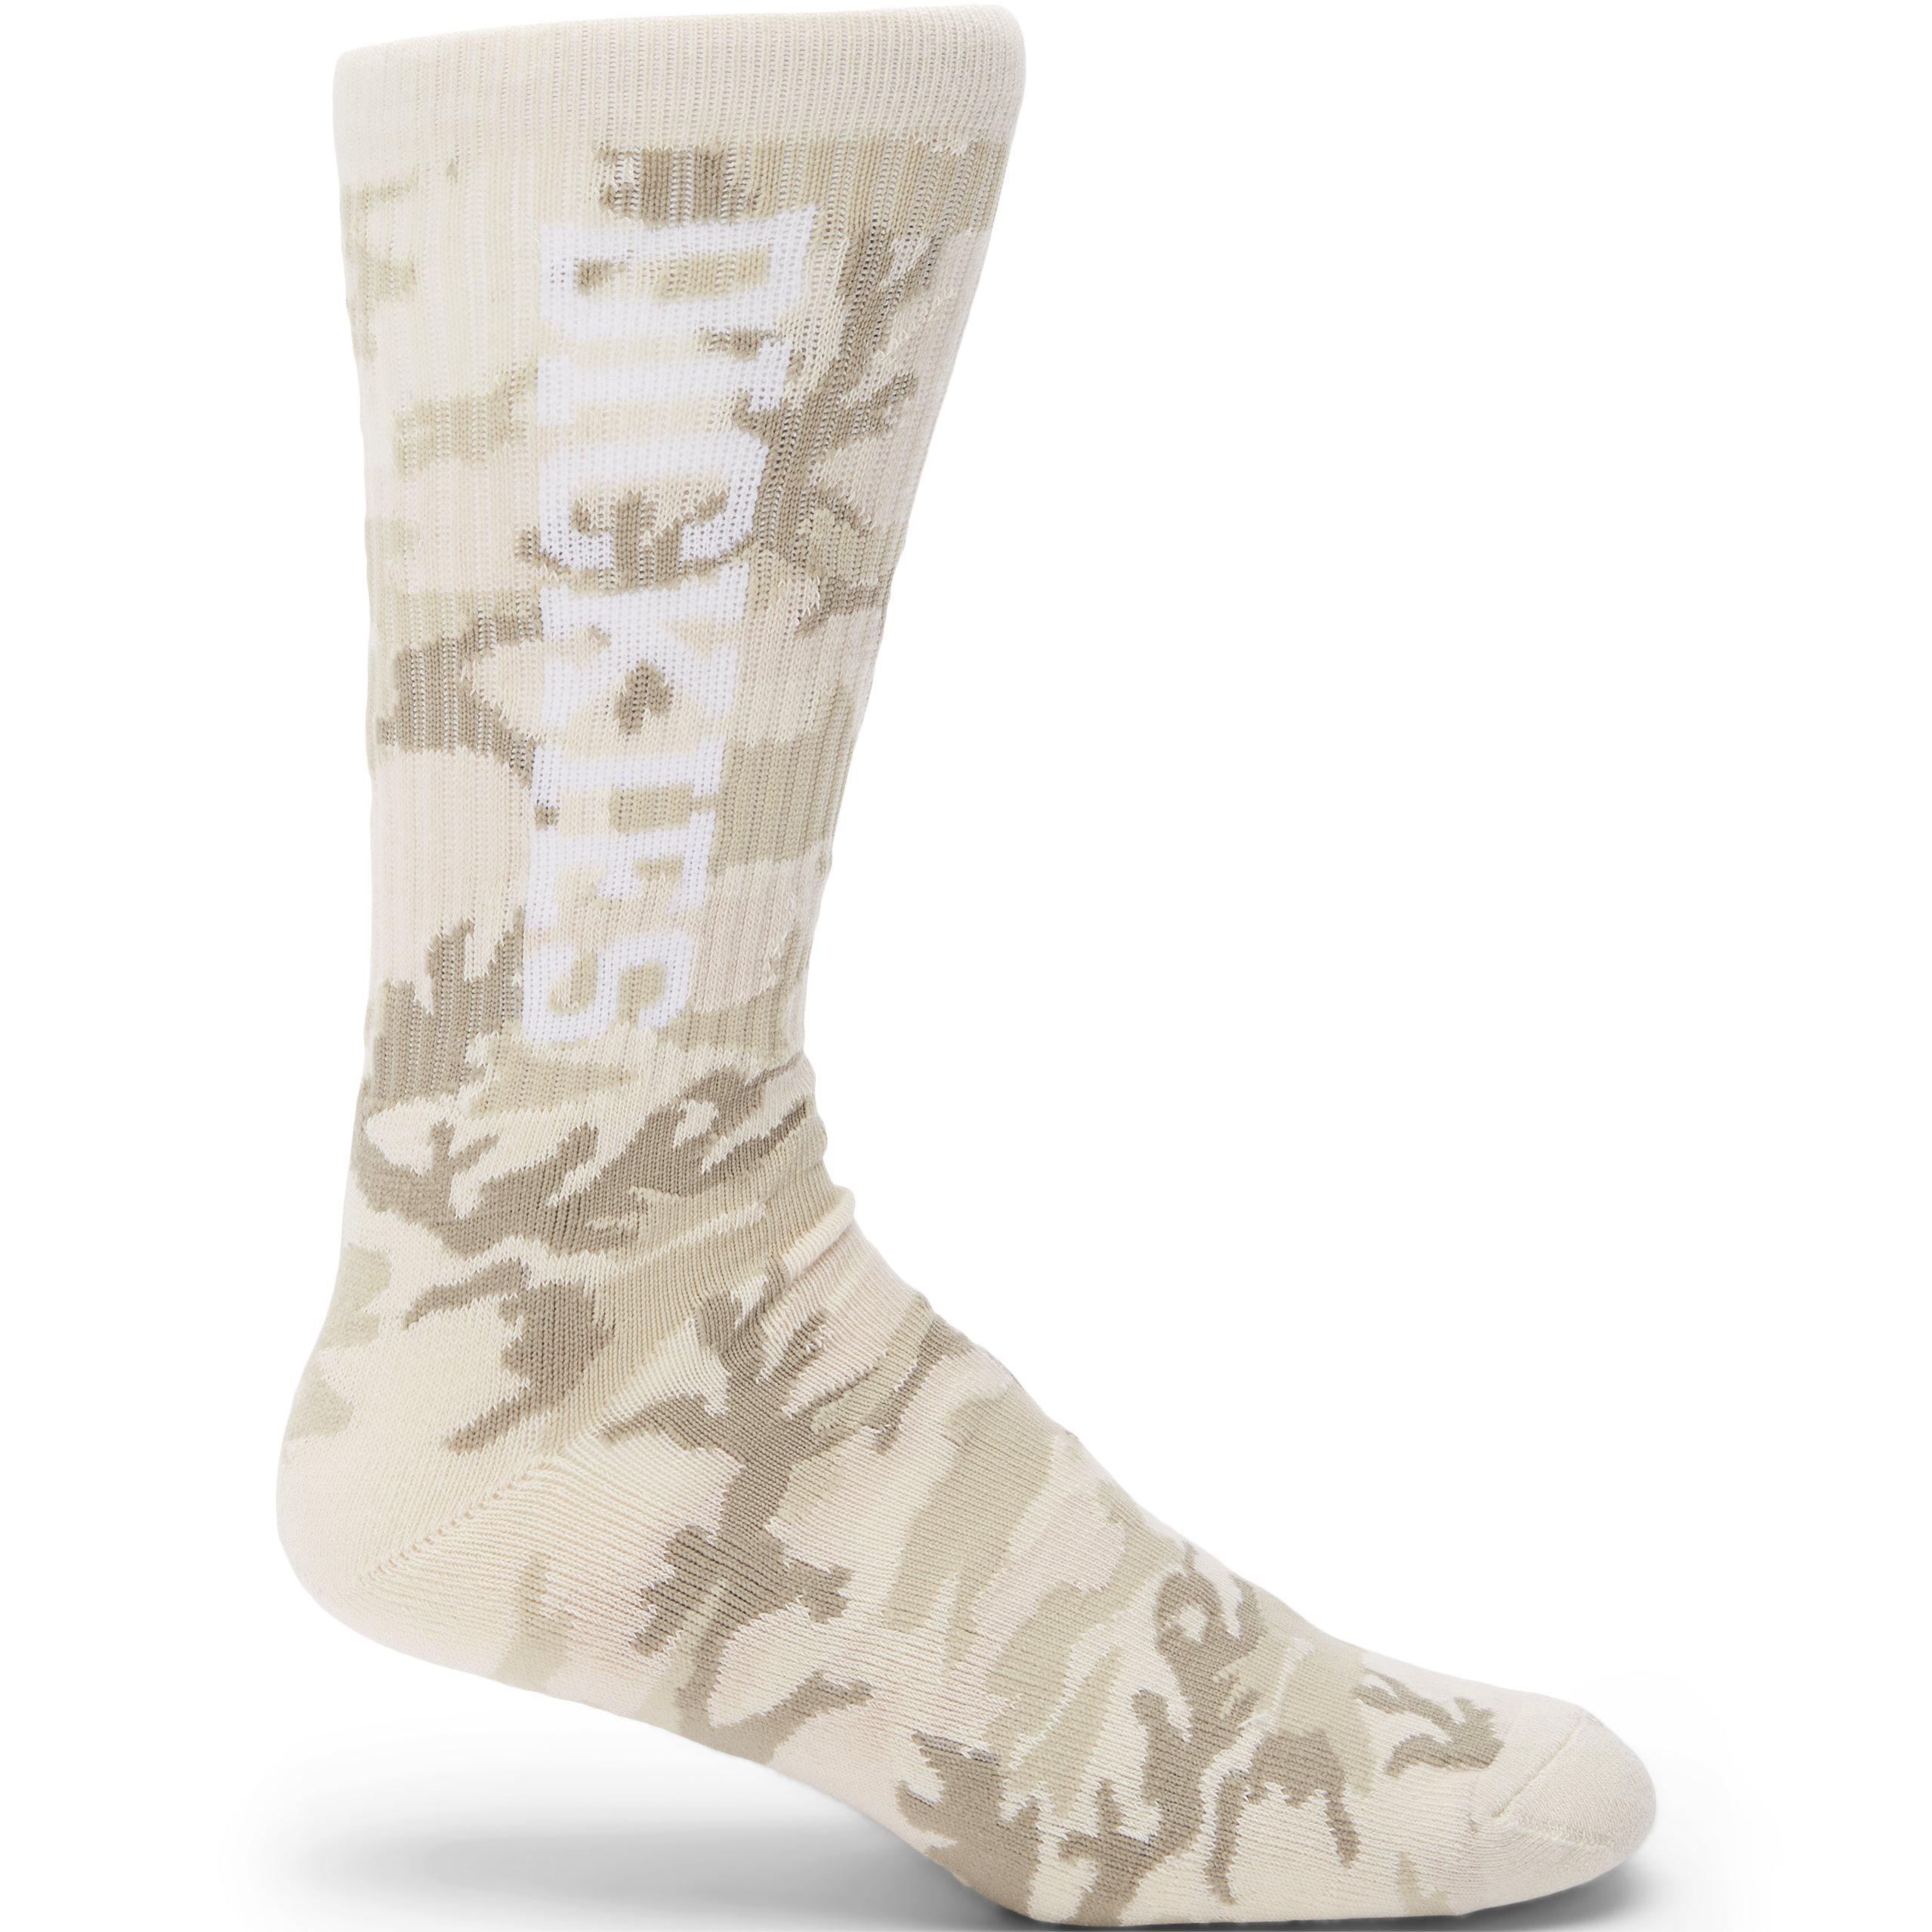 Haynesville 1-Pack Socks  - Strømper - Army